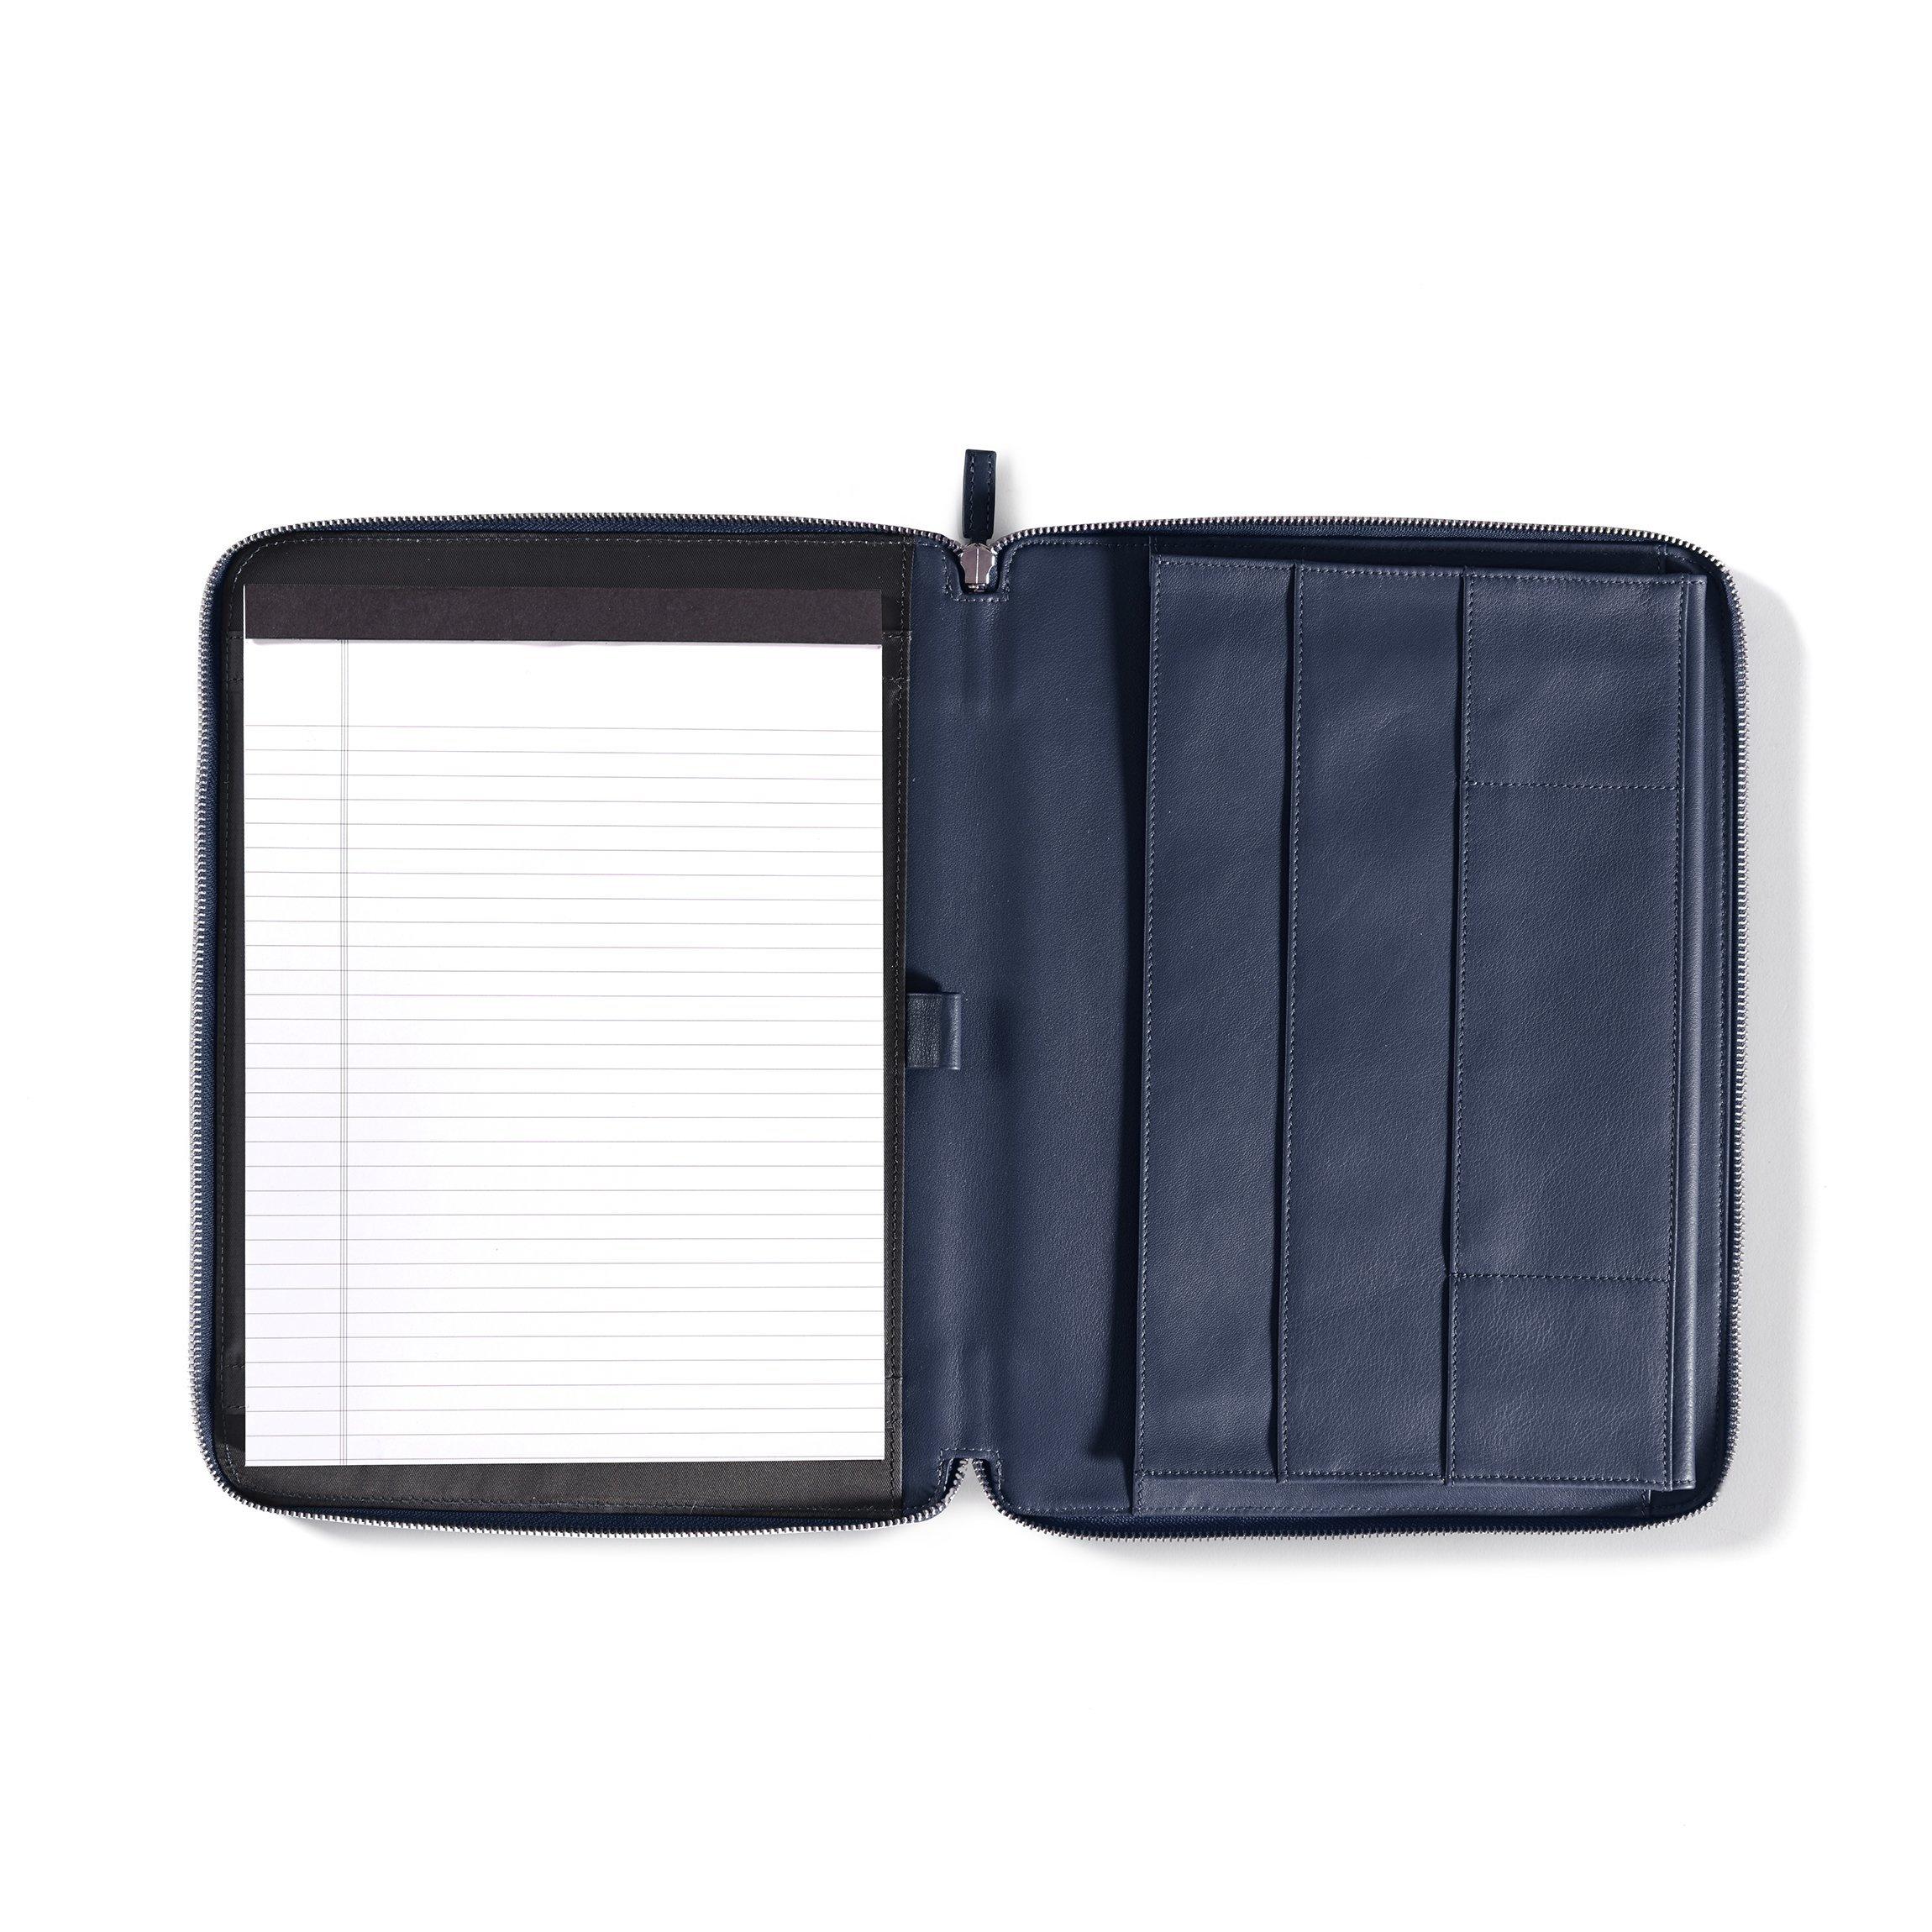 Left Handed Executive Zippered Portfolio - Full Grain Leather Leather - Navy (blue)